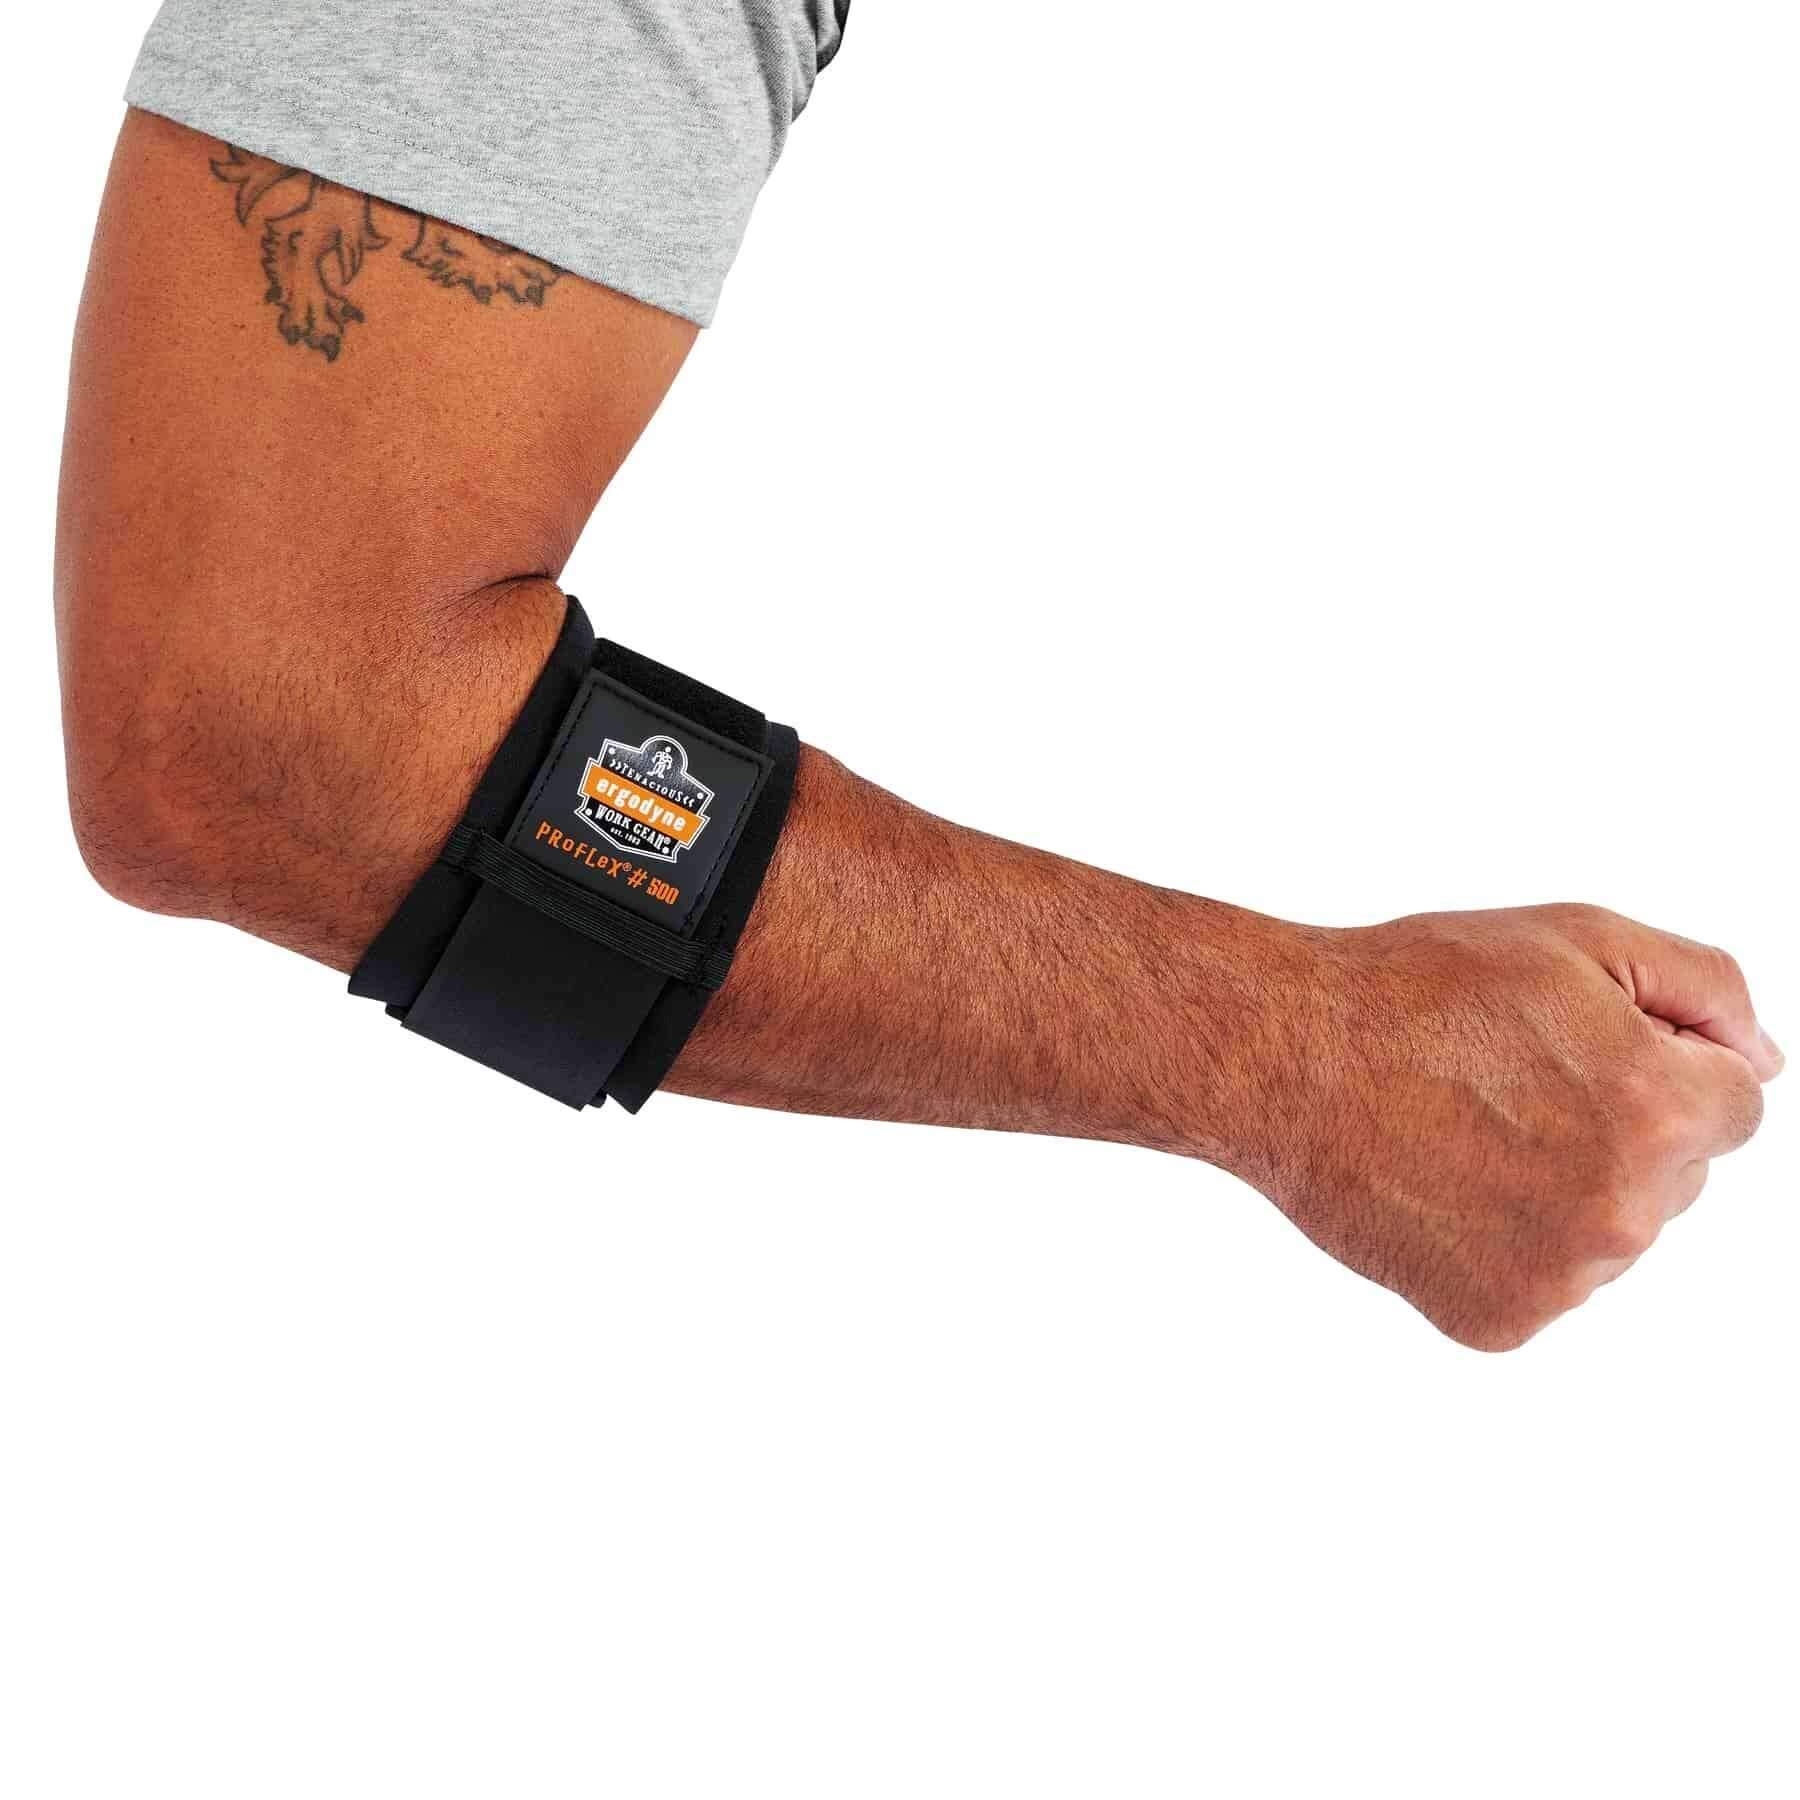 Ergodyne ProFlex 500 Elbow Support, X-Small, Black